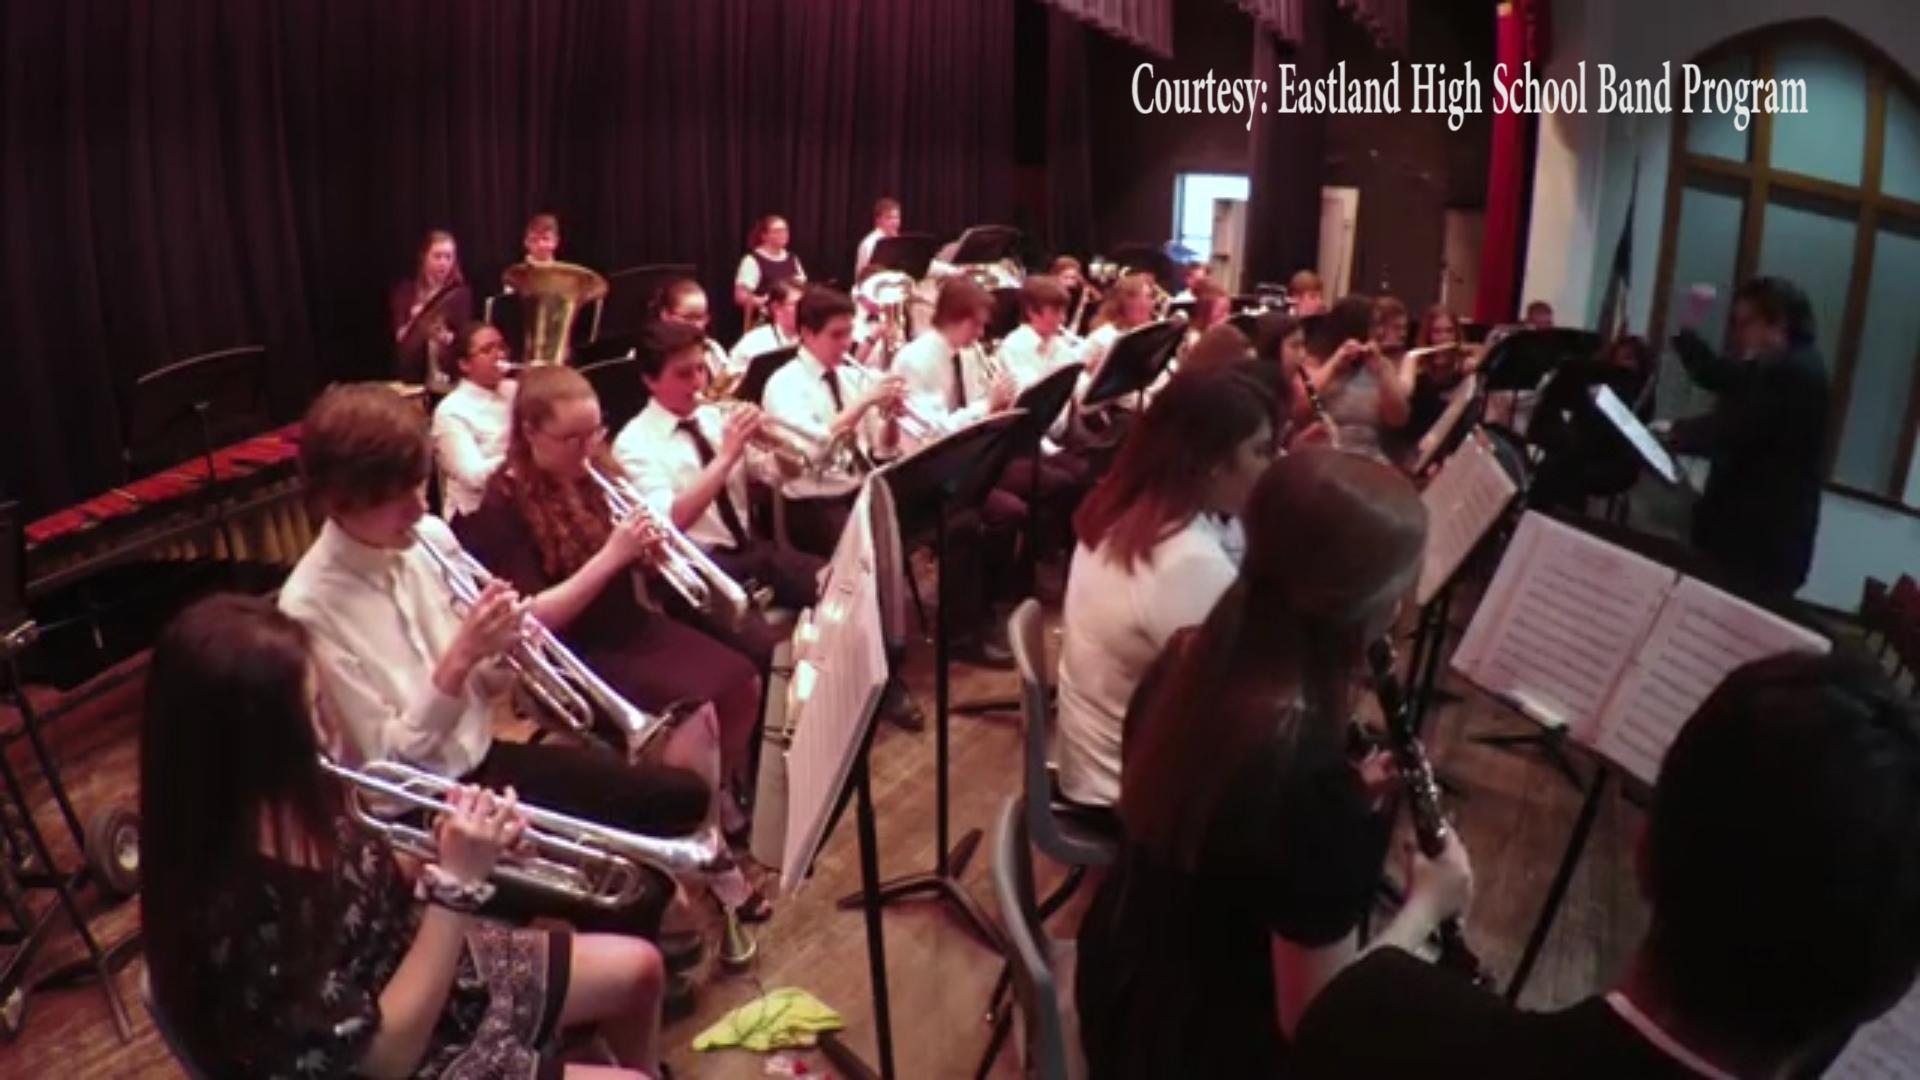 The Eastland High School Band